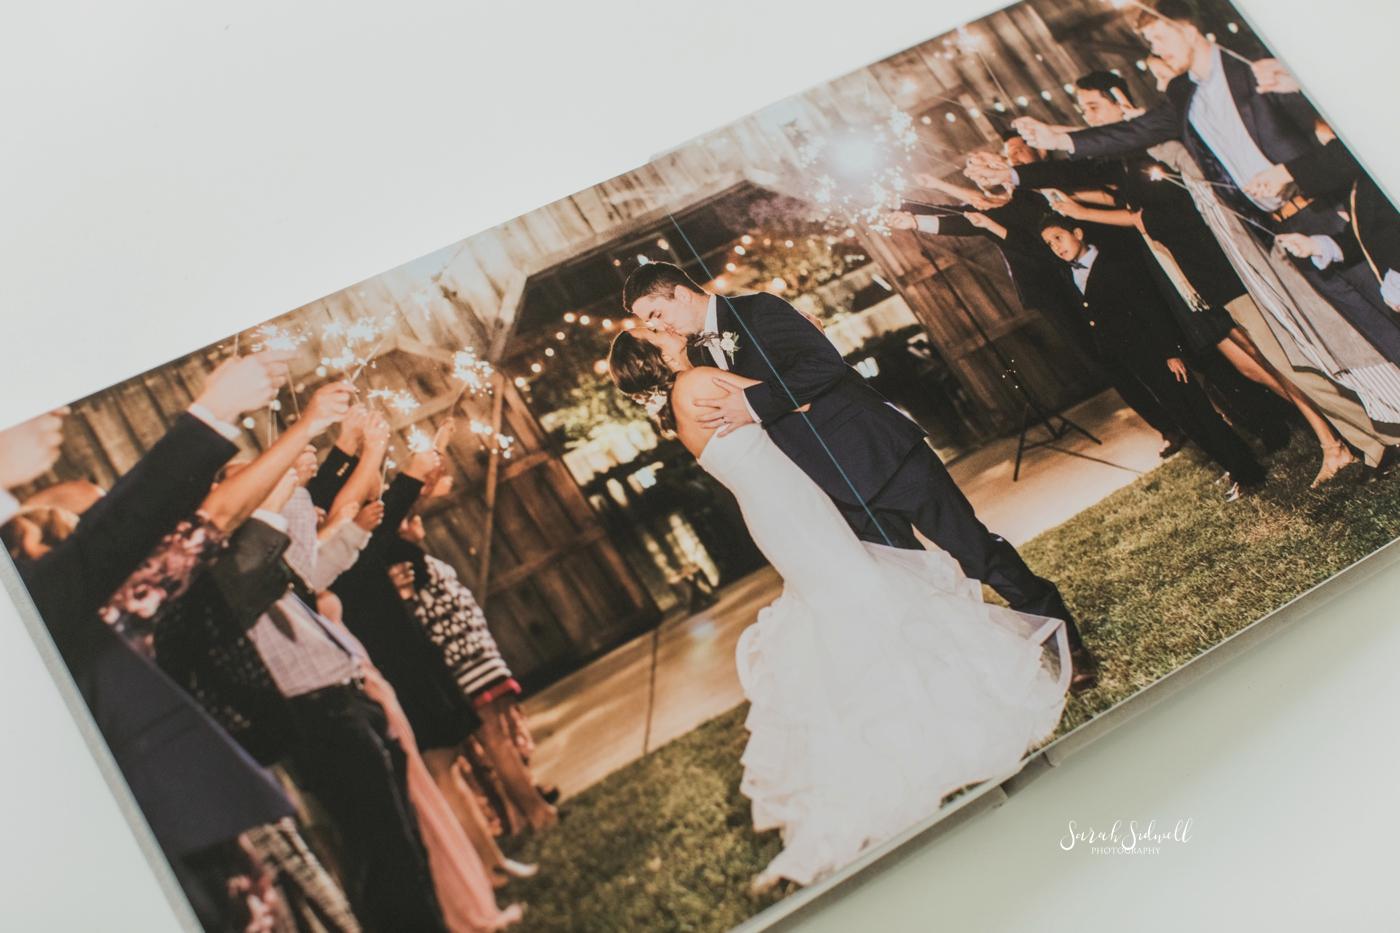 Elegant Wedding Album | Sarah Sidwell Photography